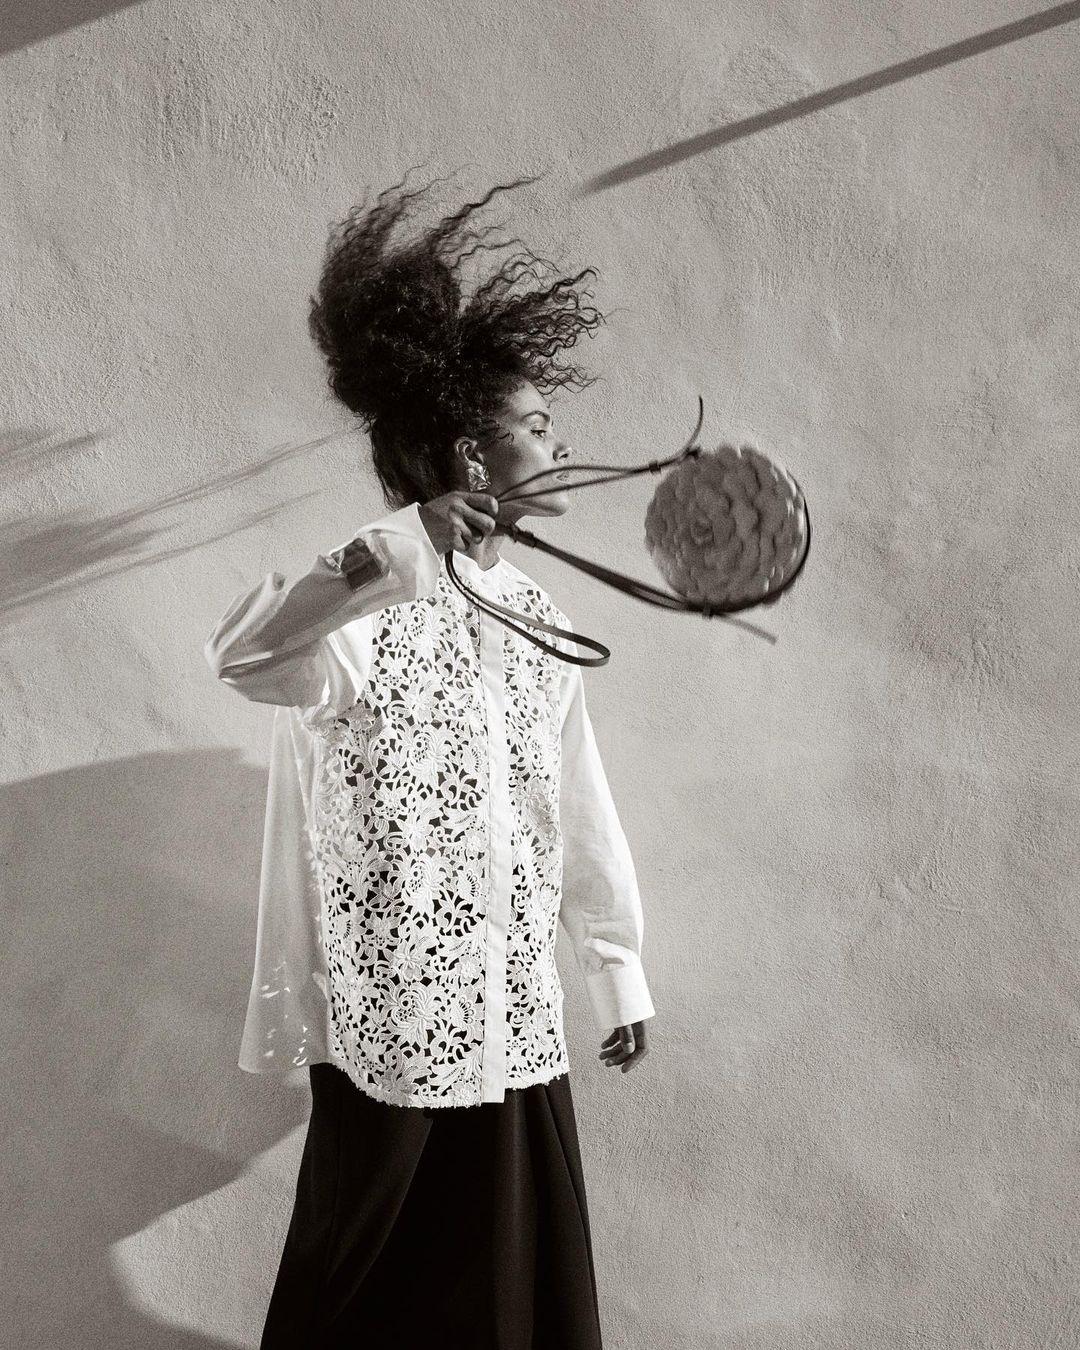 Тина Кунаки снялась обнаженной в рекламе Valentino (ФОТО) - фото №1